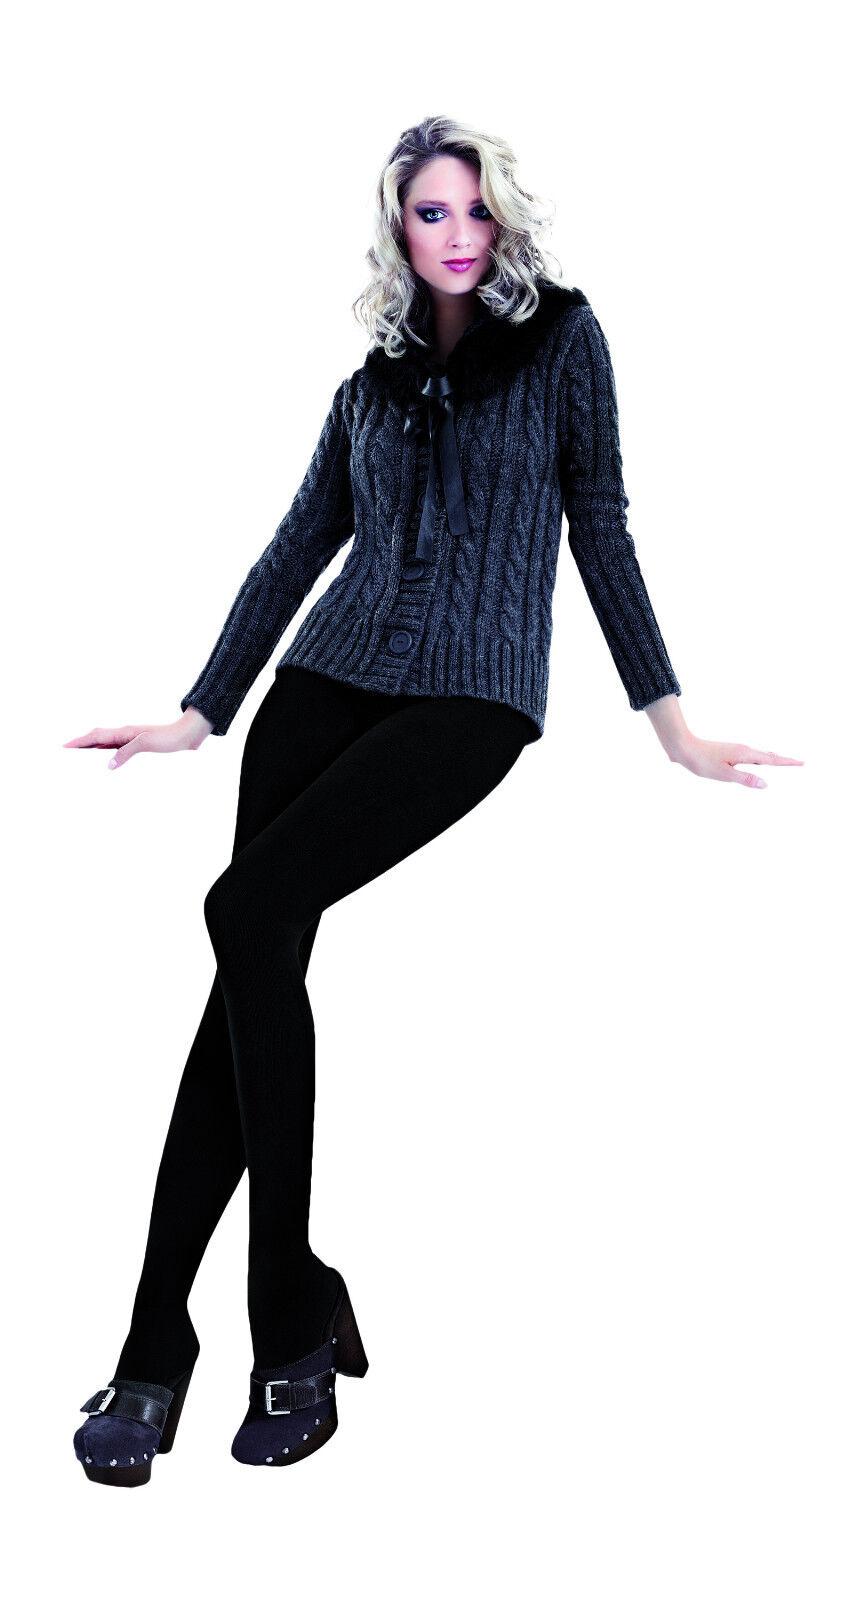 6eba576c86e New Women Girls Luxury Opaque 3D Very Warm Cotton with Wool Tights S M L XL  XXL